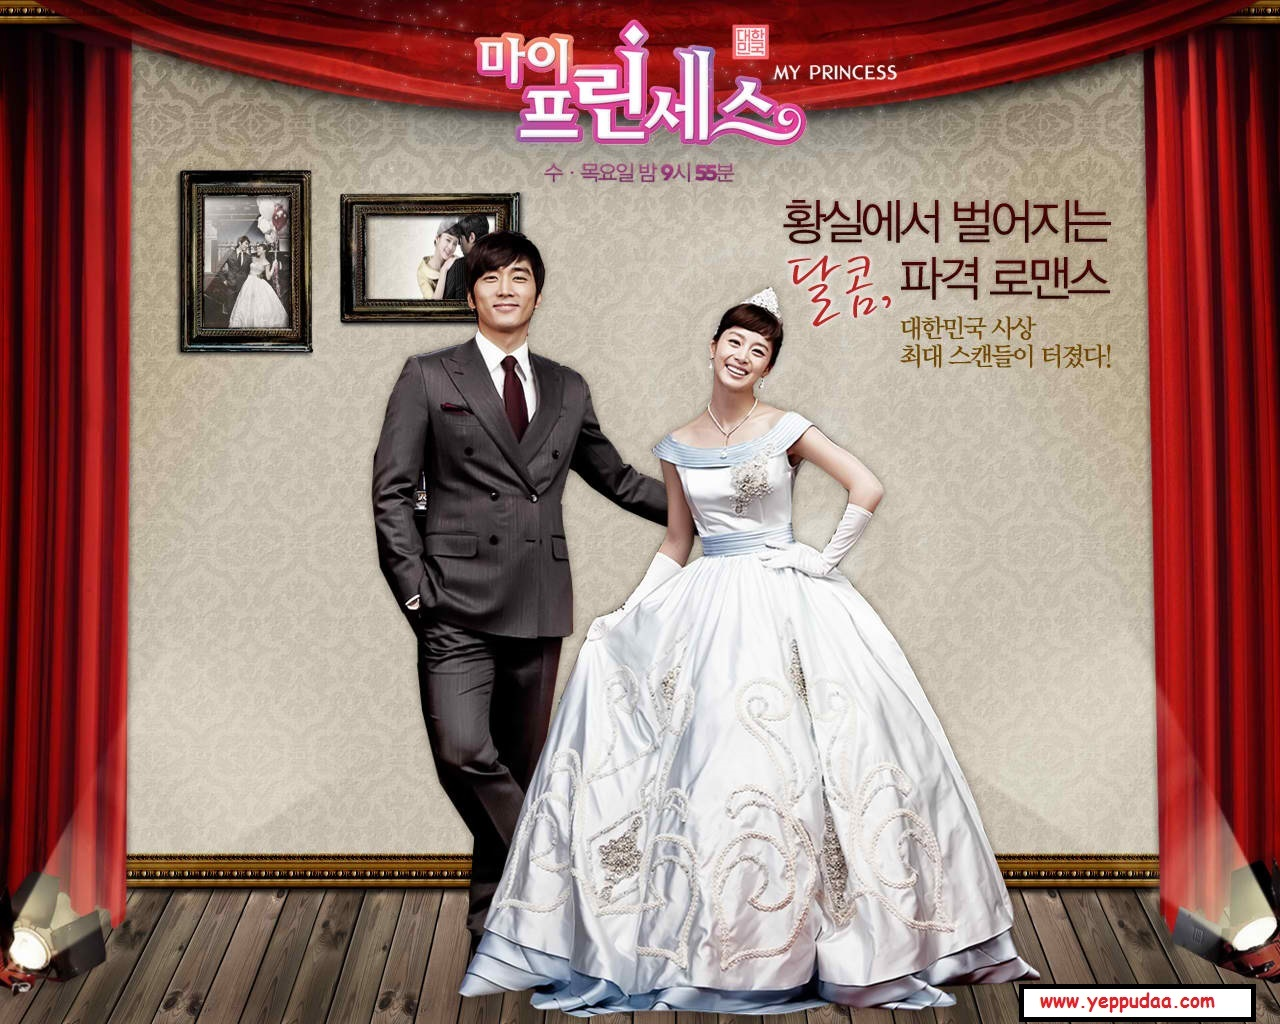 My Princess / Mai Peurinseseu / 2011 / G�ney Kore / Online Dizi �zle